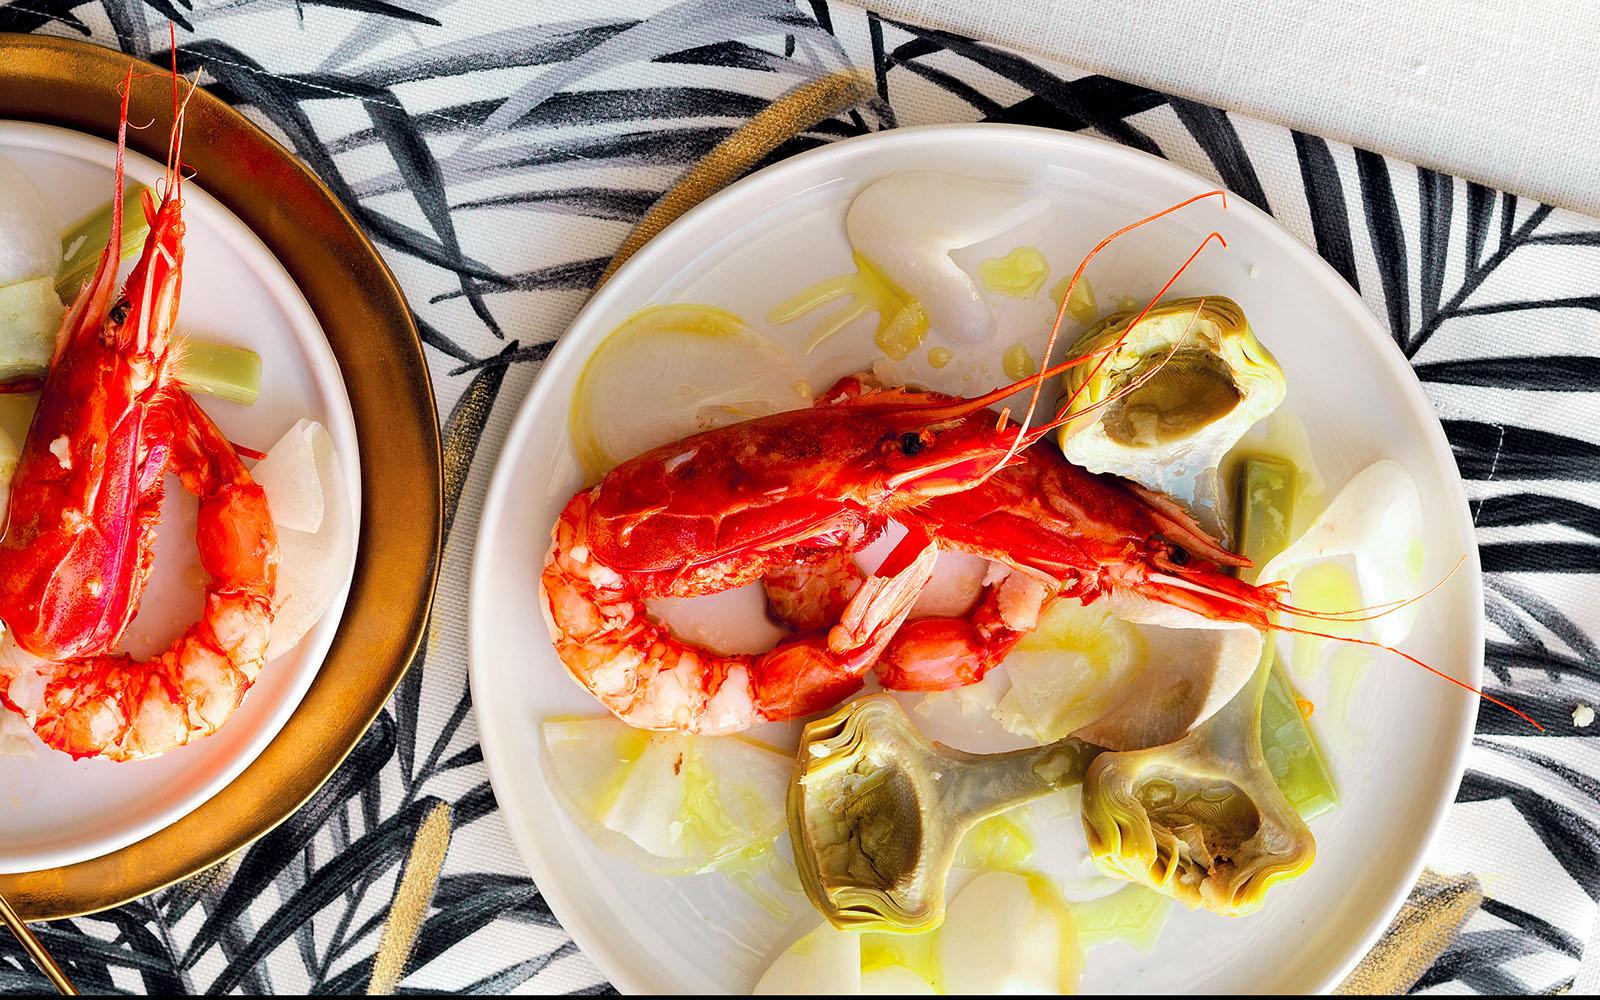 Recipe Shrimp and artichoke salad with turnips and pecorino